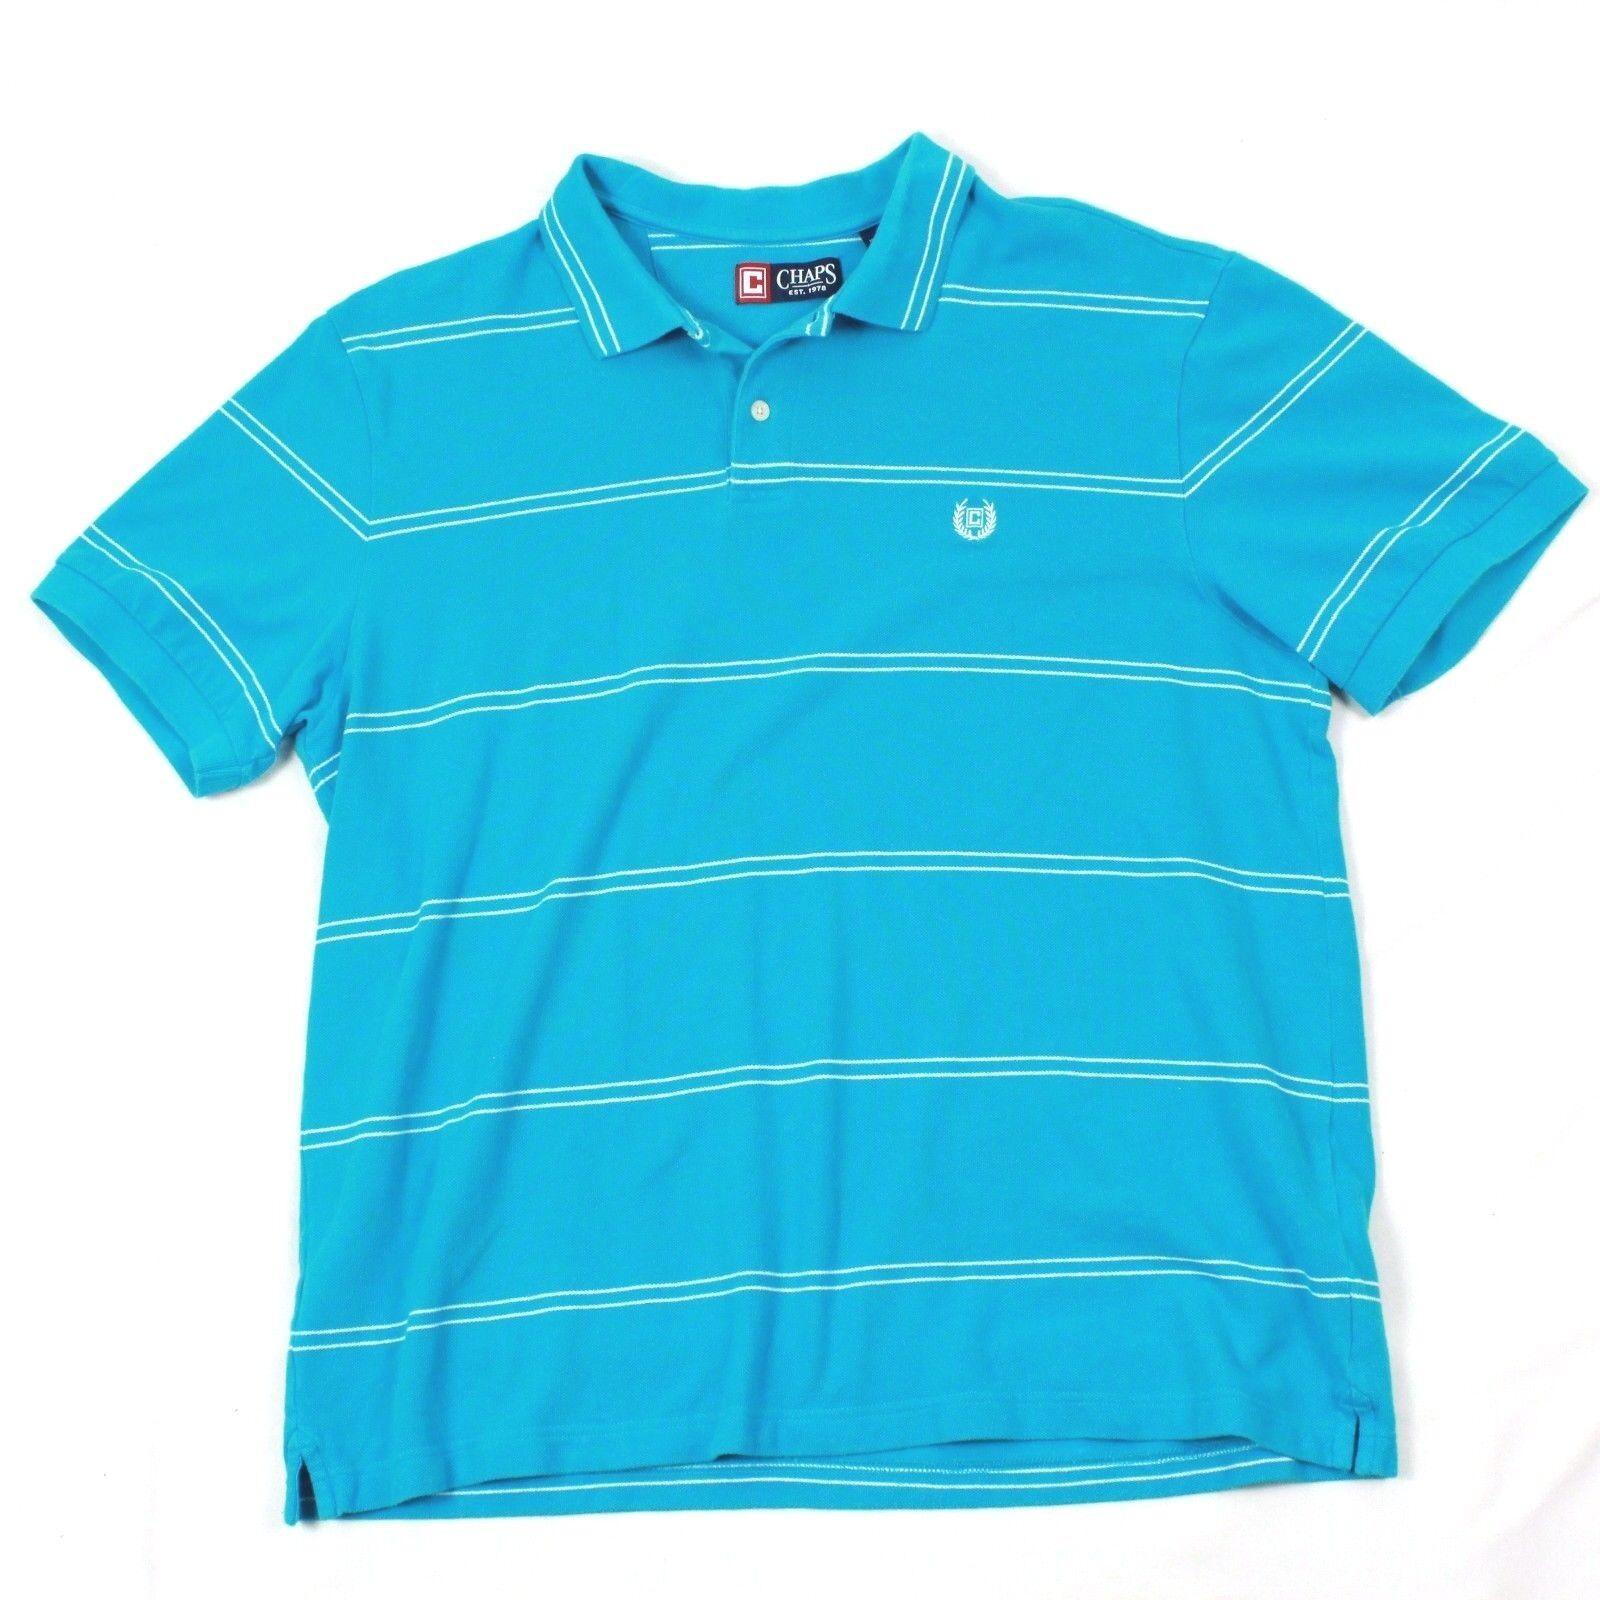 VTG Ralph Lauren Size XL Mens Polo Chaps Crest Monogram Cotton Baby bluee Tee